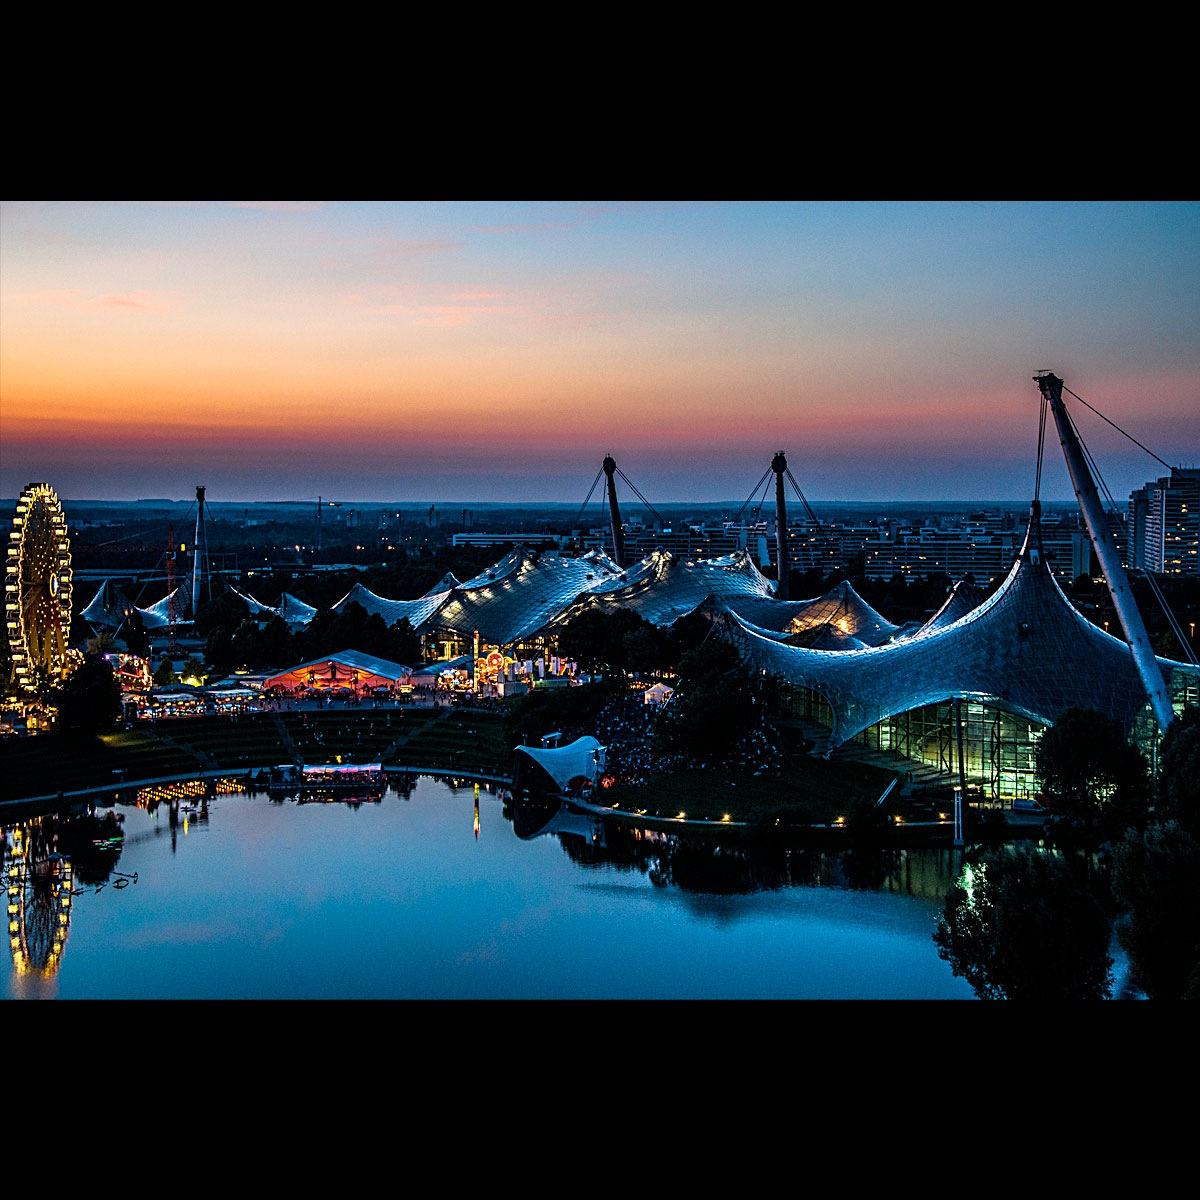 Munich - Olympic area by Michael Alverdes